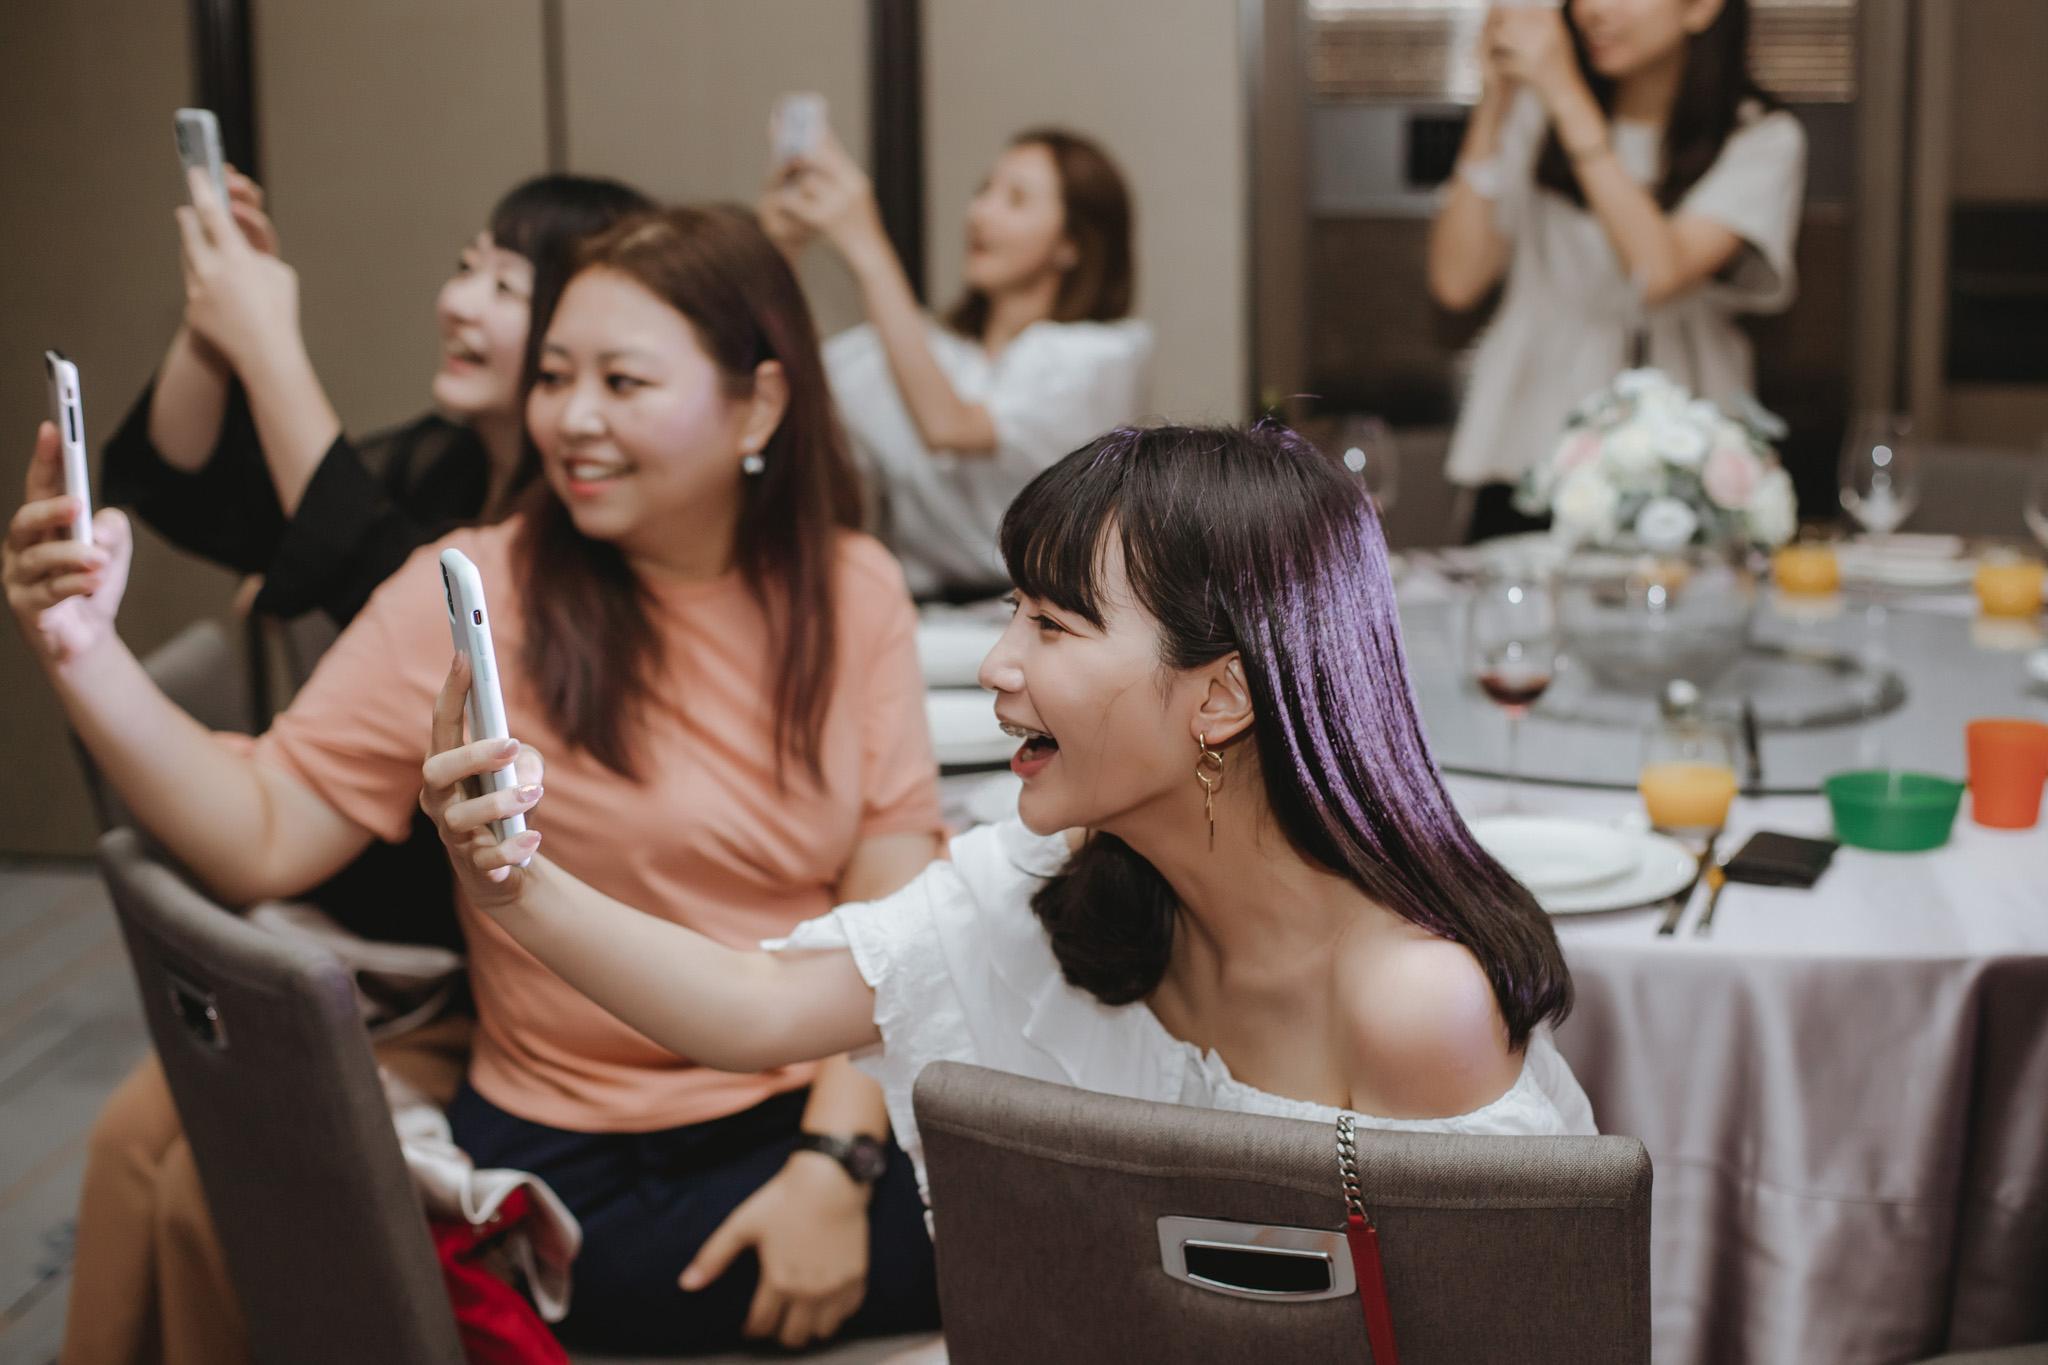 EW 居米 台北禮服 台北婚紗 台北婚攝 國泰萬怡 台北婚禮-21